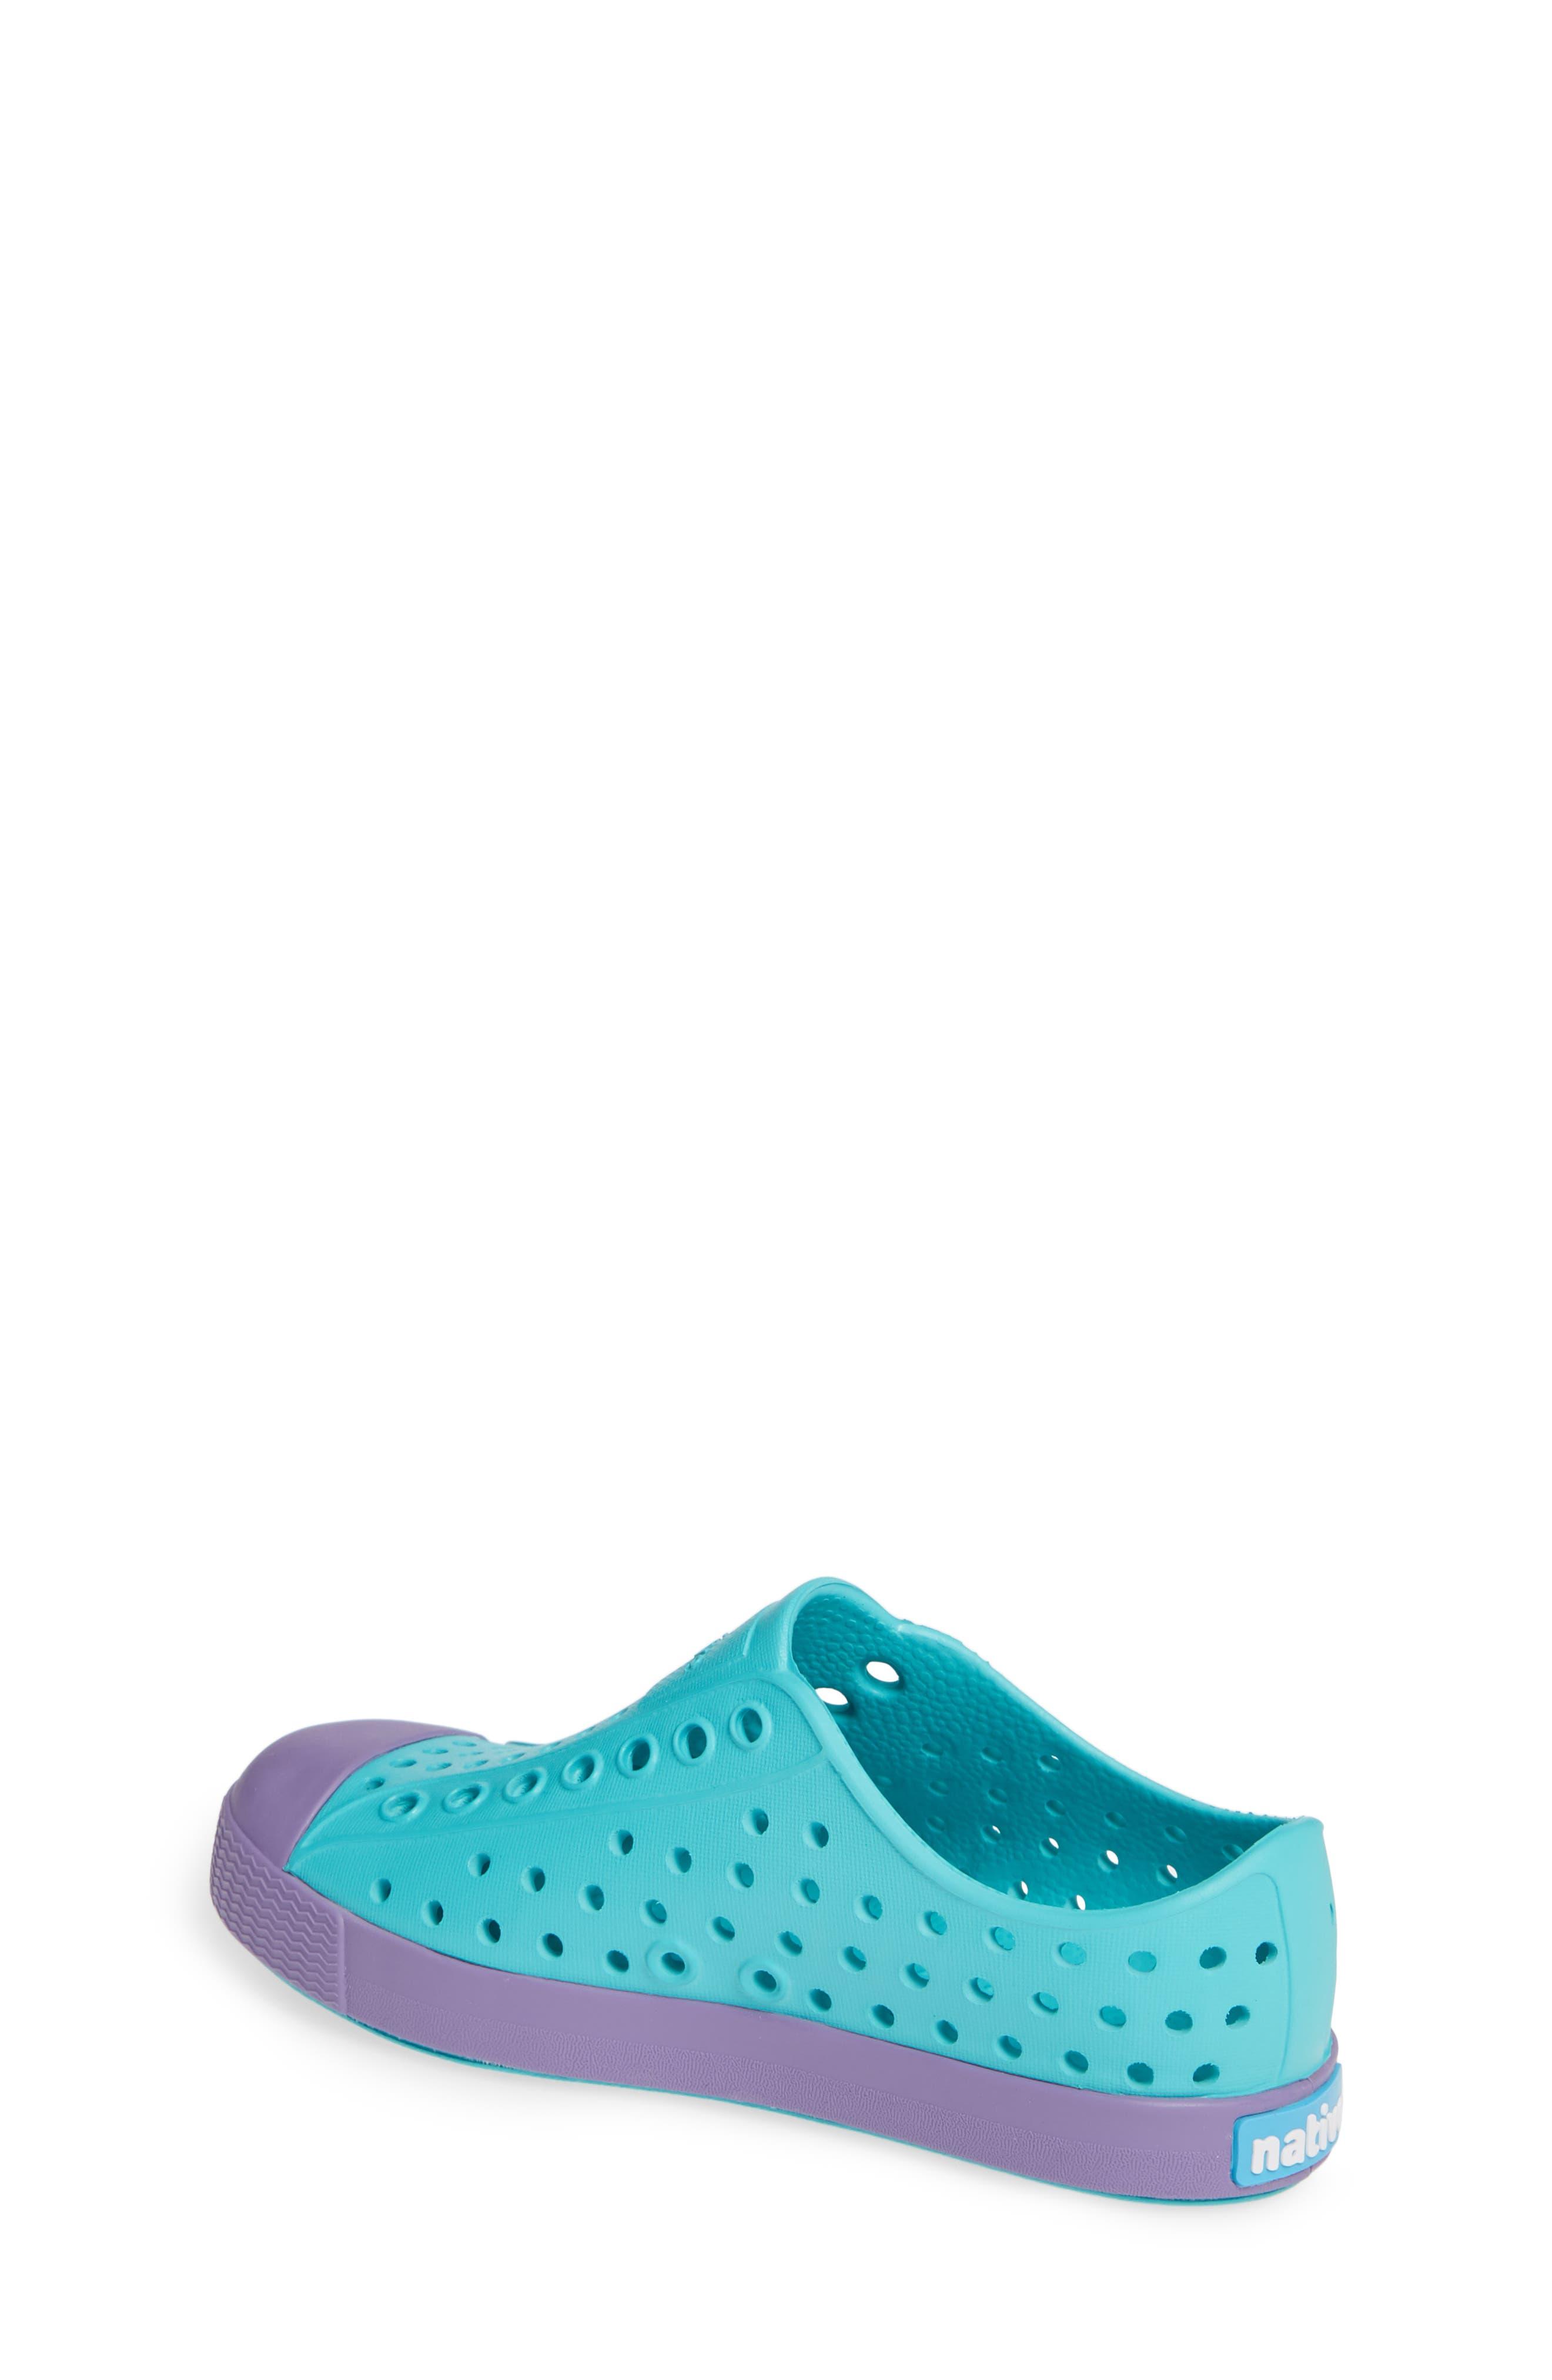 'Jefferson' Water Friendly Slip-On Sneaker,                             Alternate thumbnail 75, color,